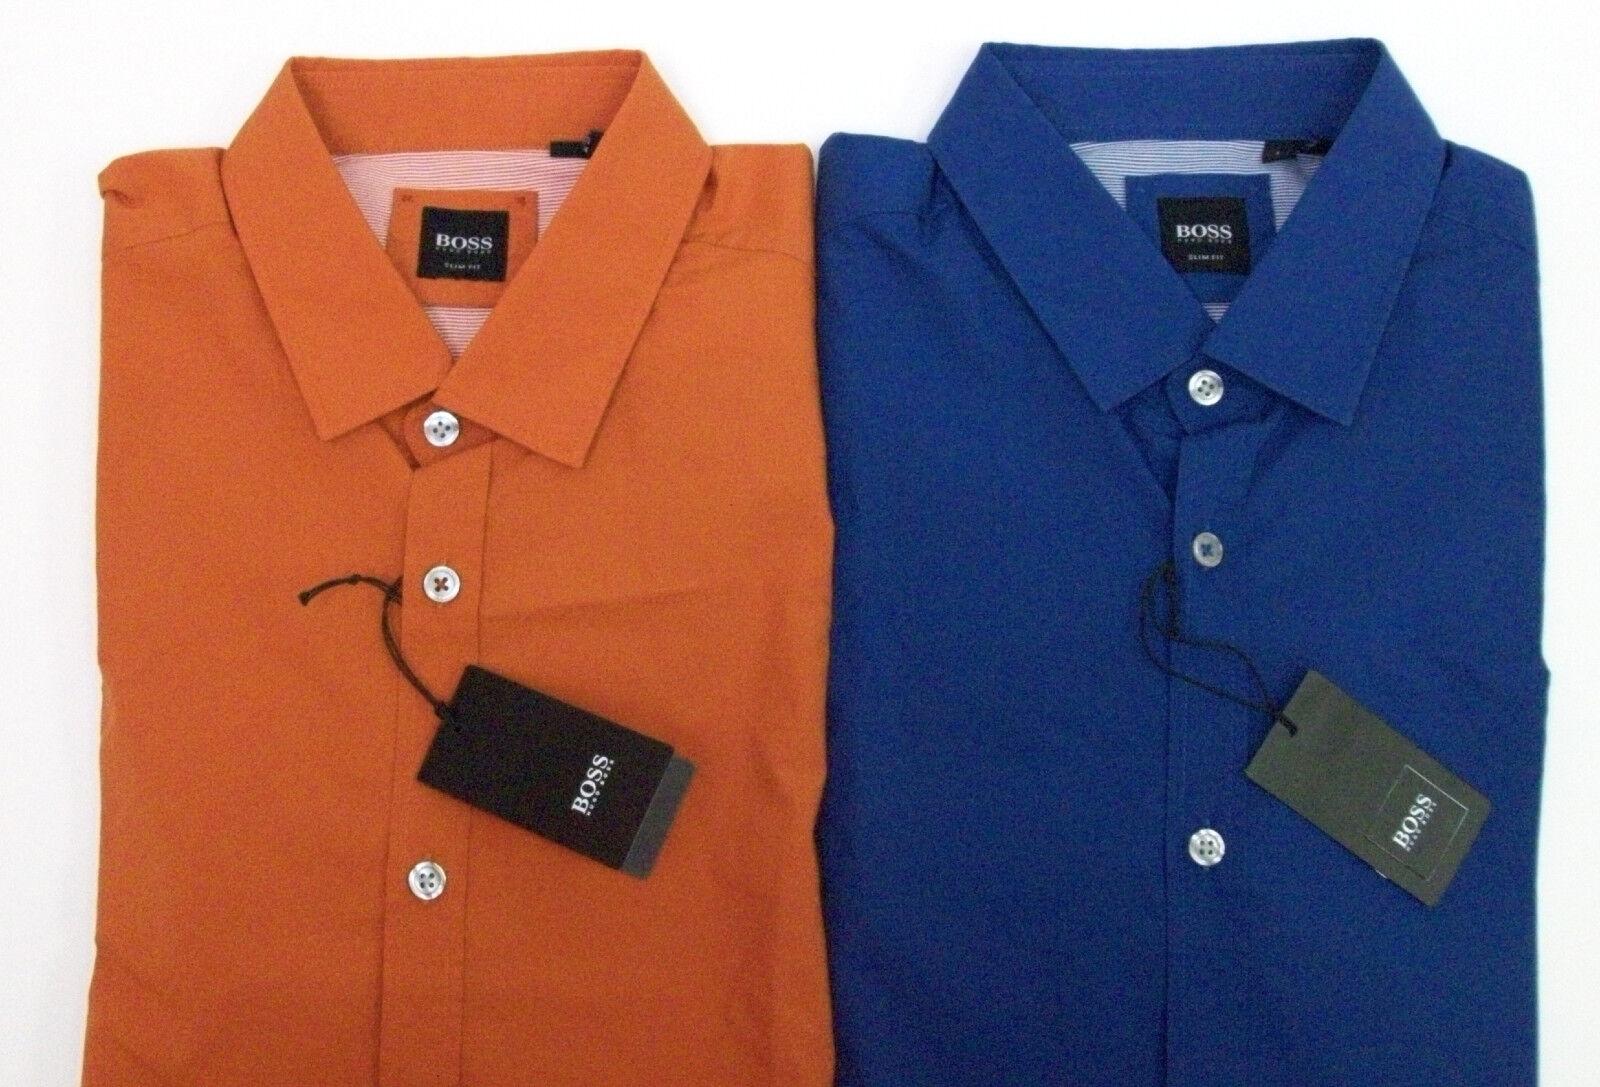 312b11d4dfaea9 Hugo Boss Slim Fit Cotton Sport Shirt Spread Collar bluee Rust NWT ...